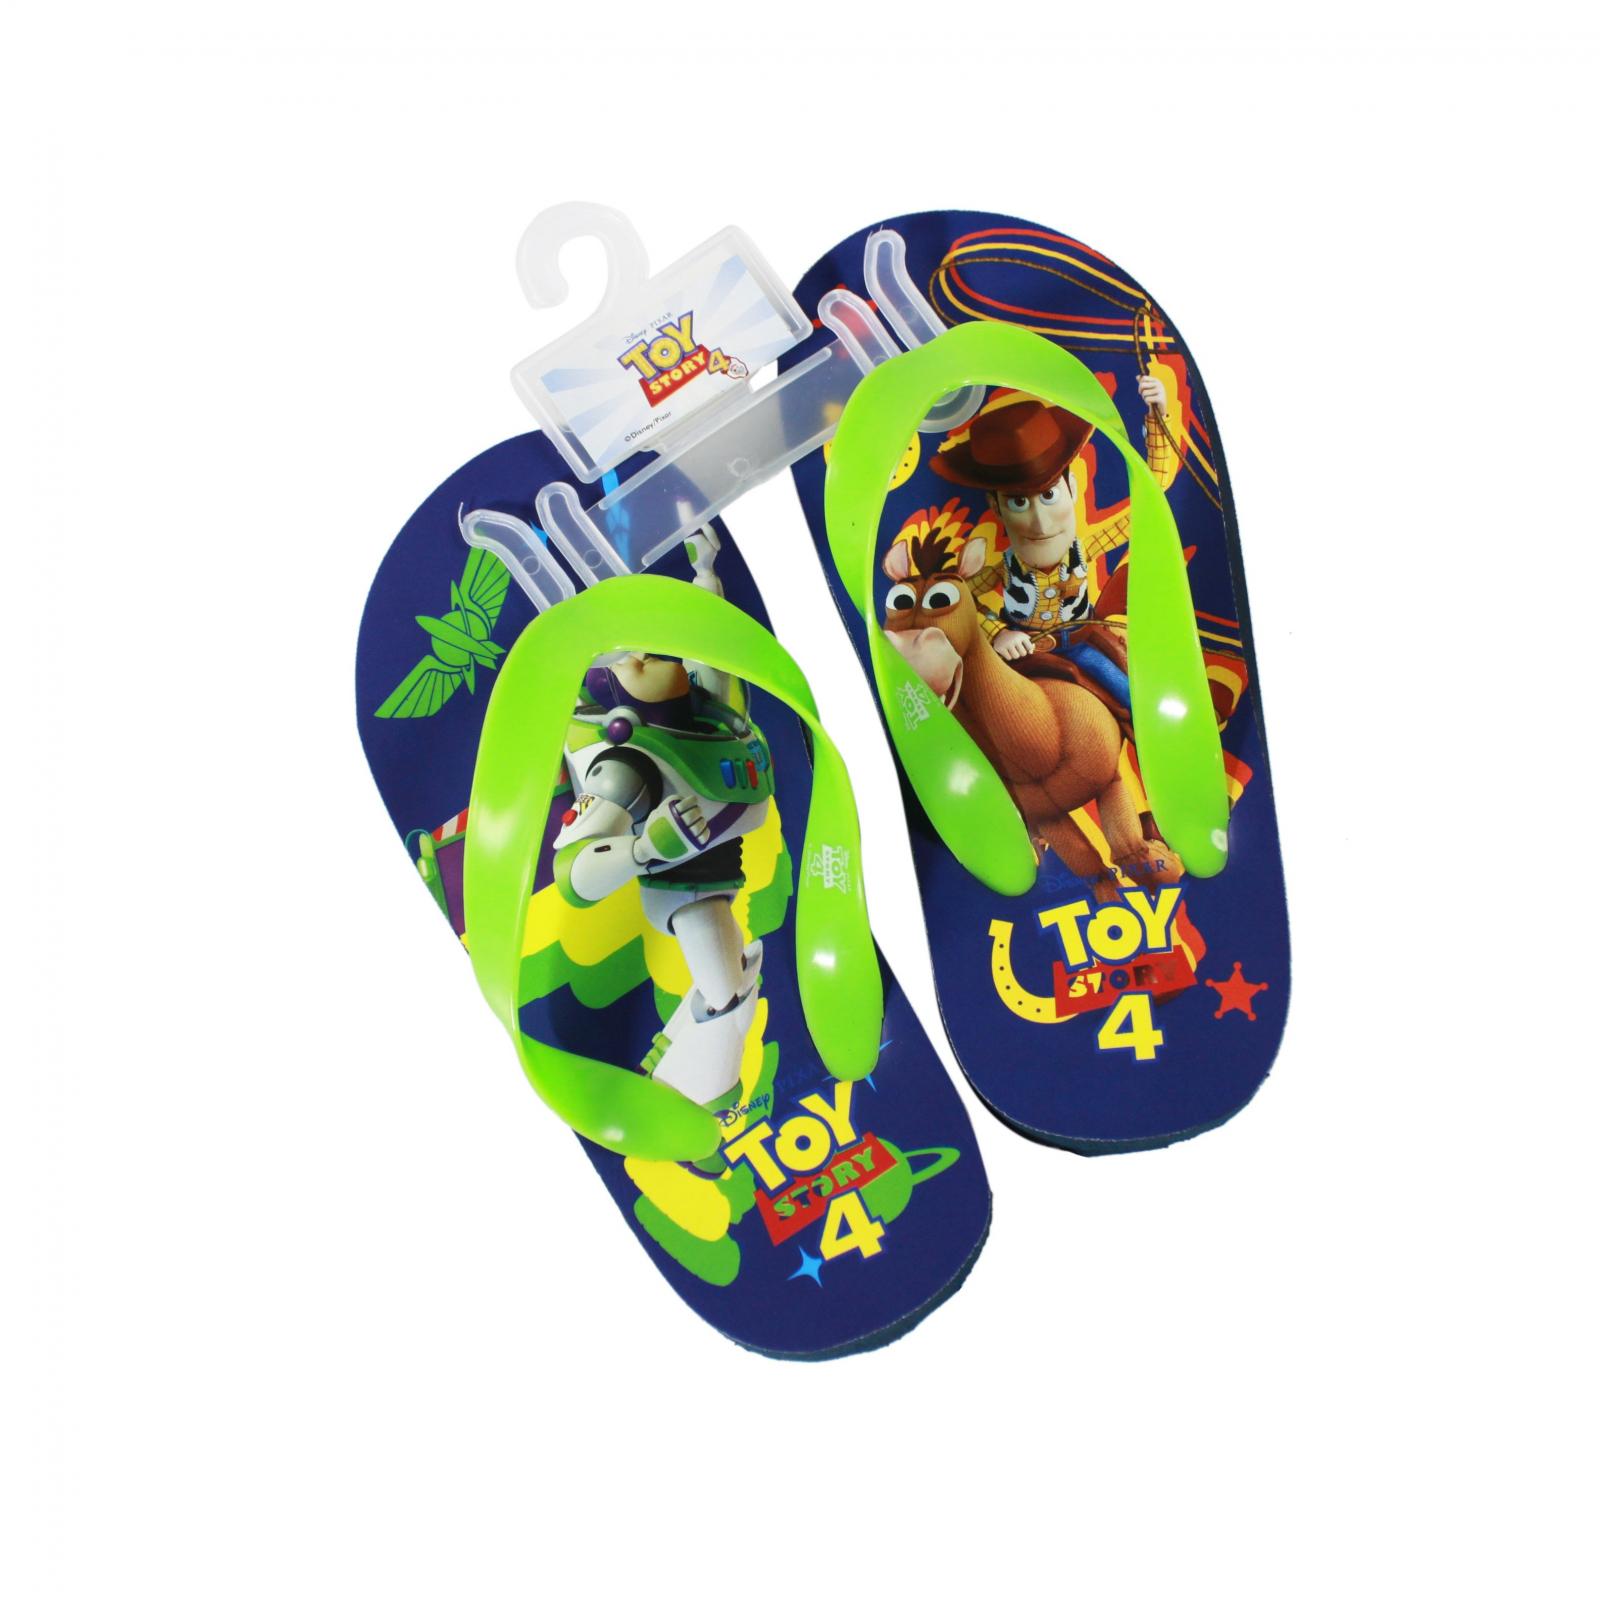 Disney Pixar Toy Story 4 Kid Sandals Green Strap Small 11/12